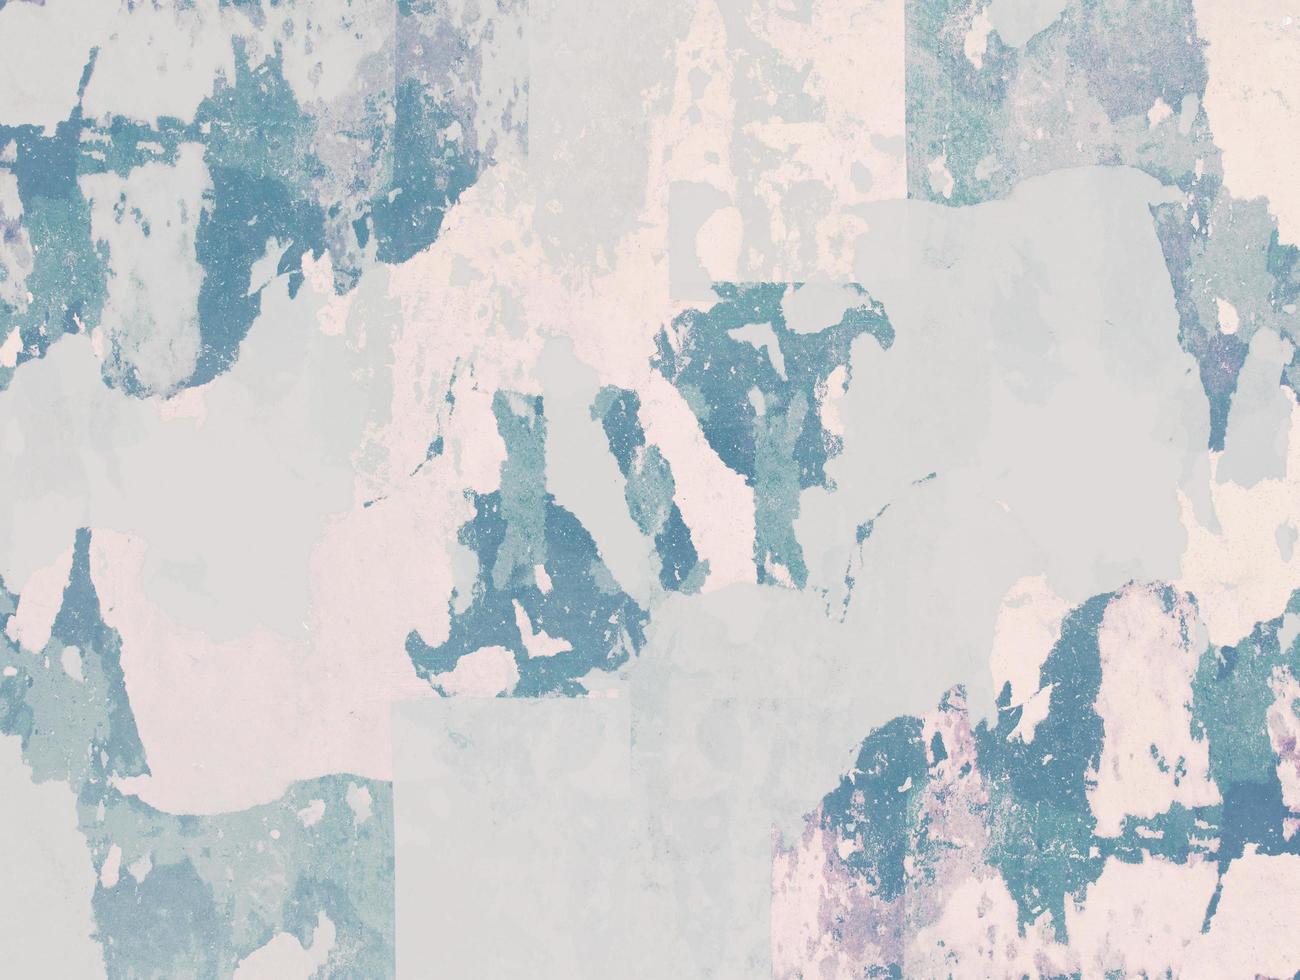 abstracte grunge muur textuur foto